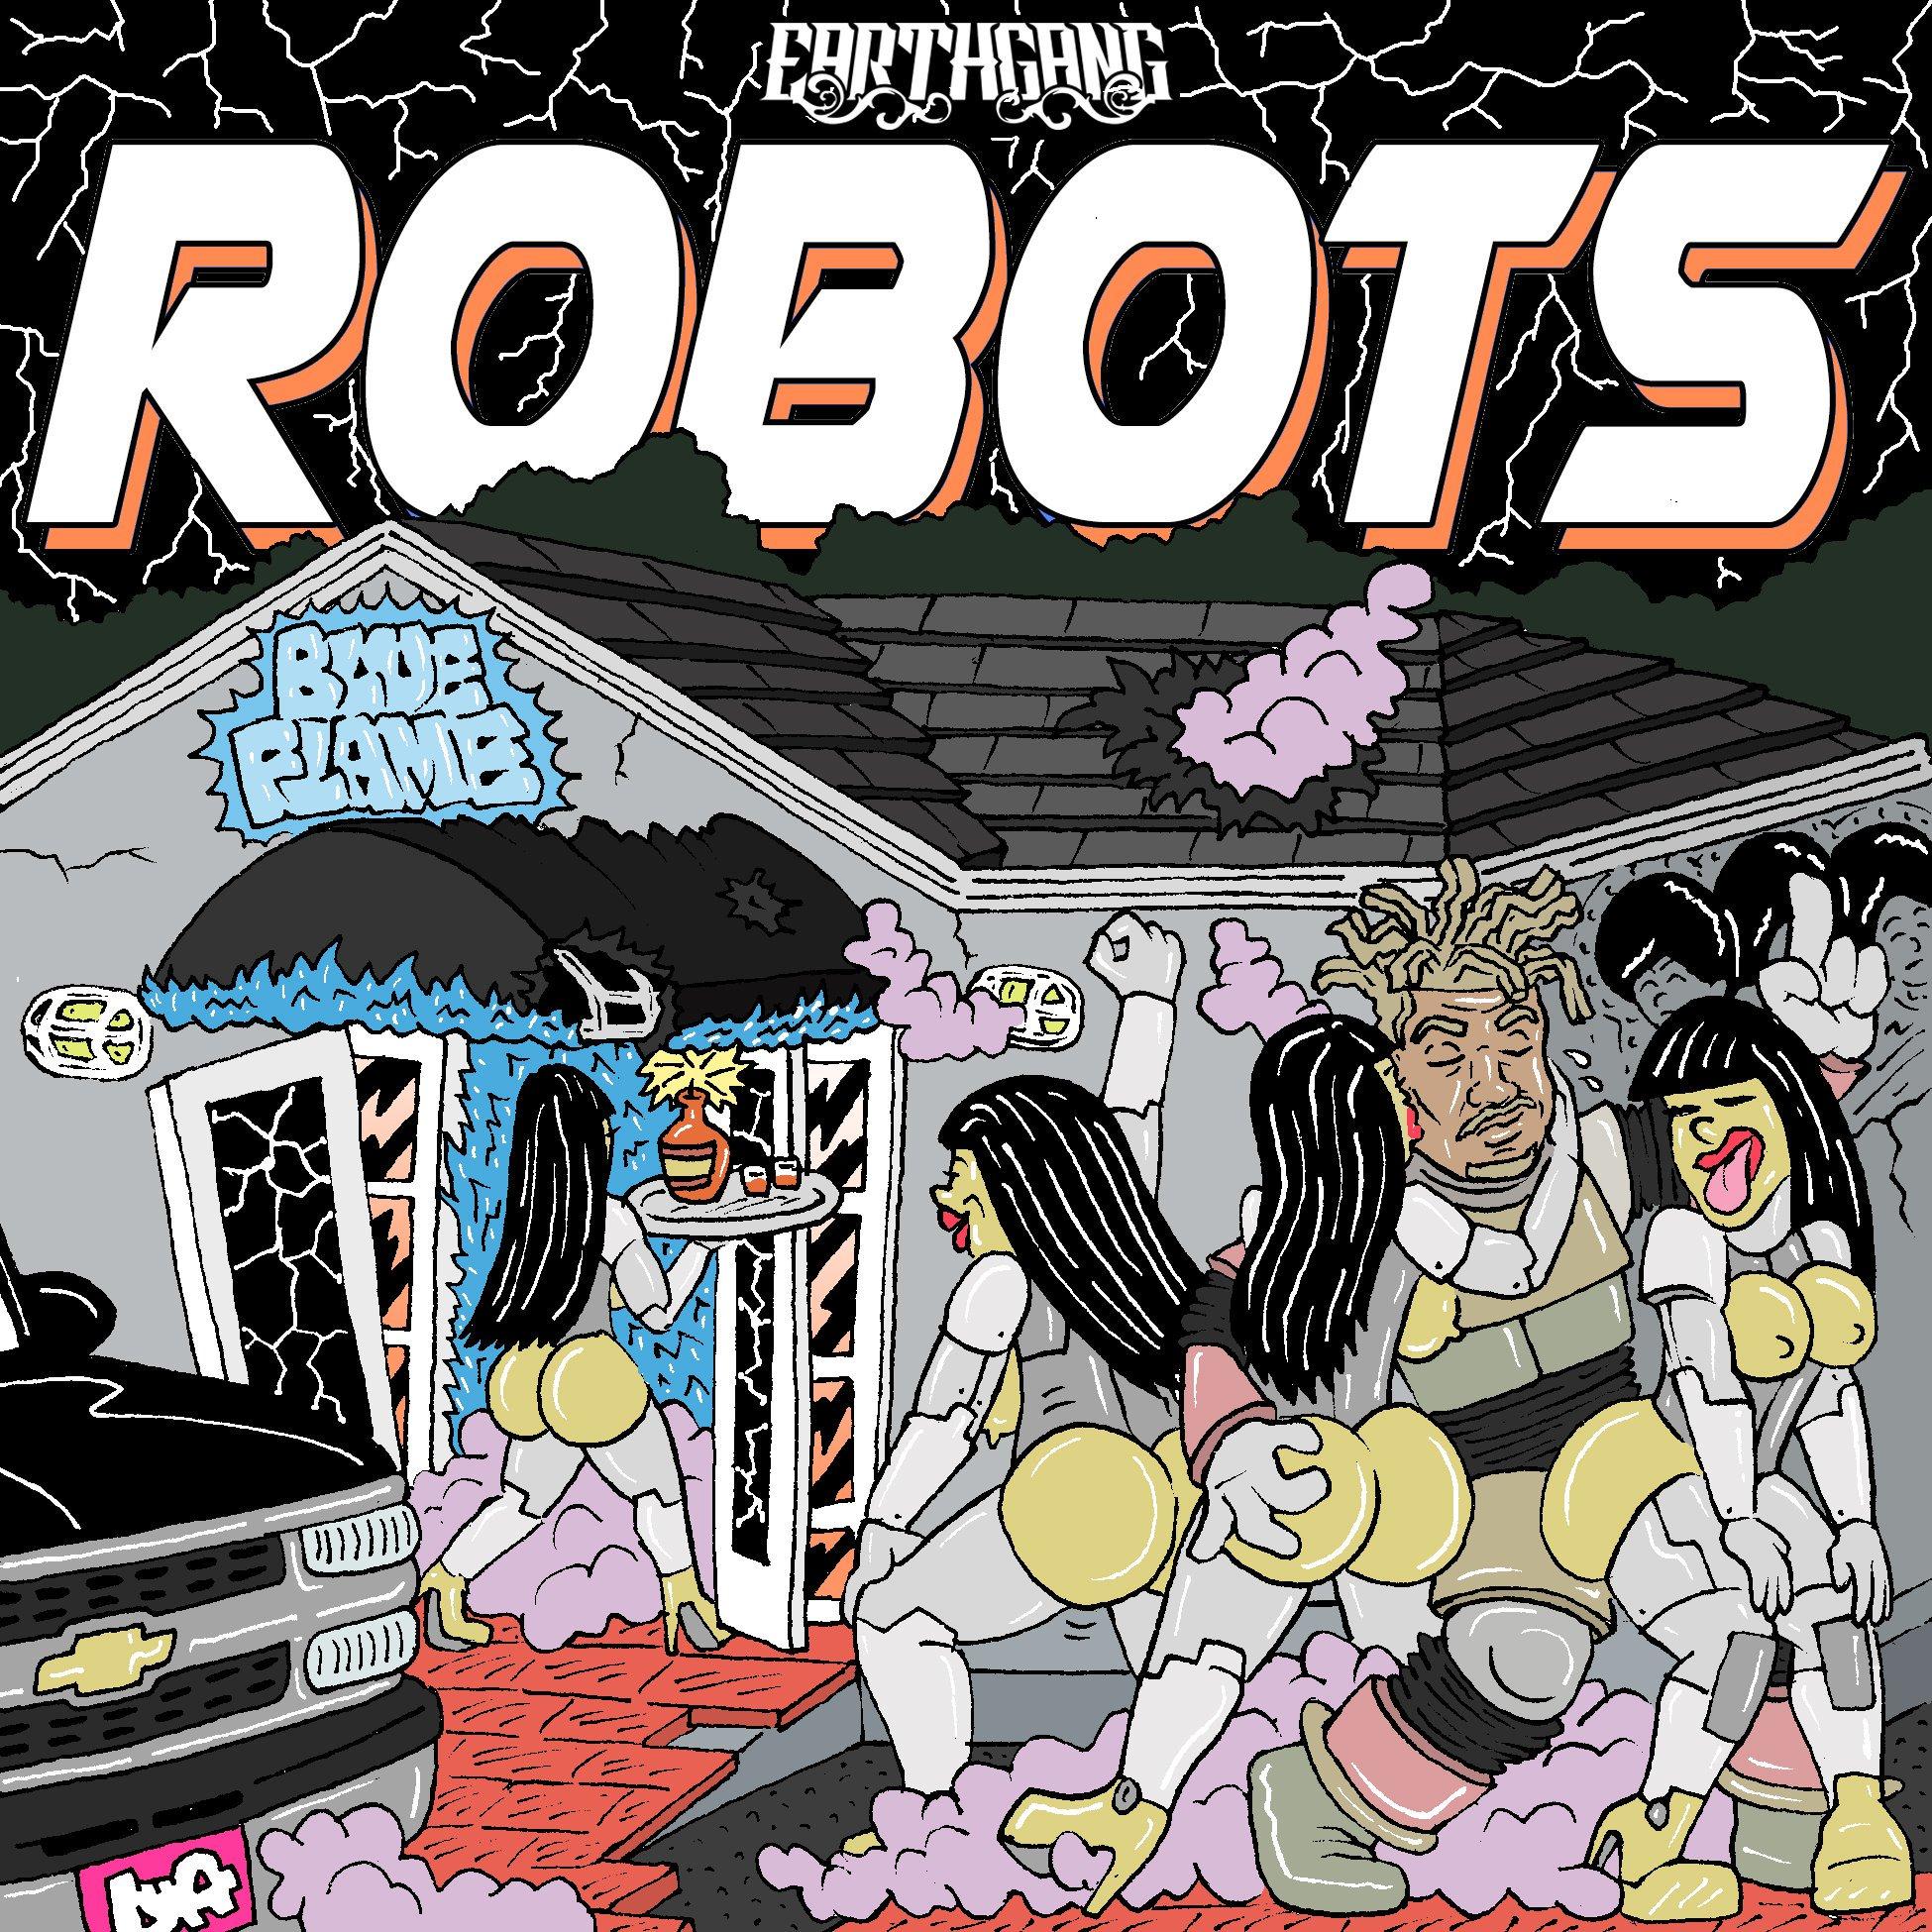 New Music: @EarthGang 'Robots' https://t.co/geicUVrFx9 https://t.co/3mC9AkbqNN